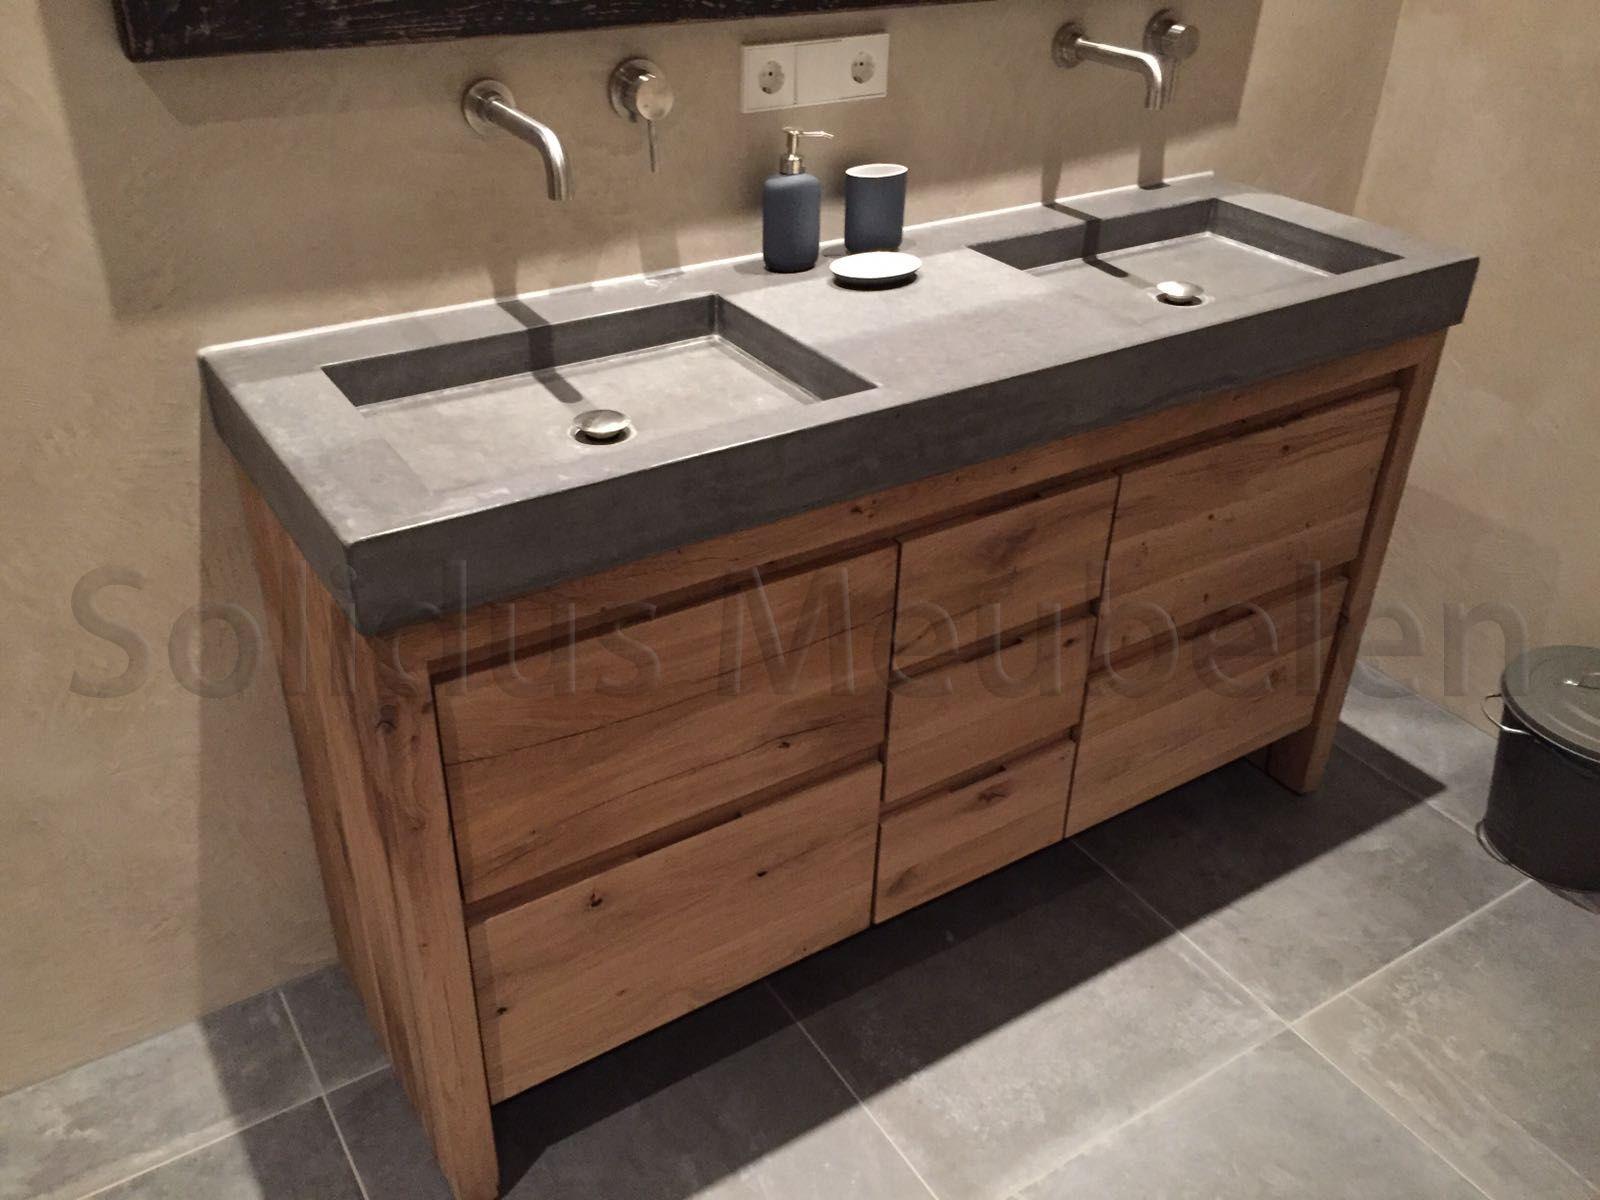 maatwerk badkamermeubel van oud eiken en beton